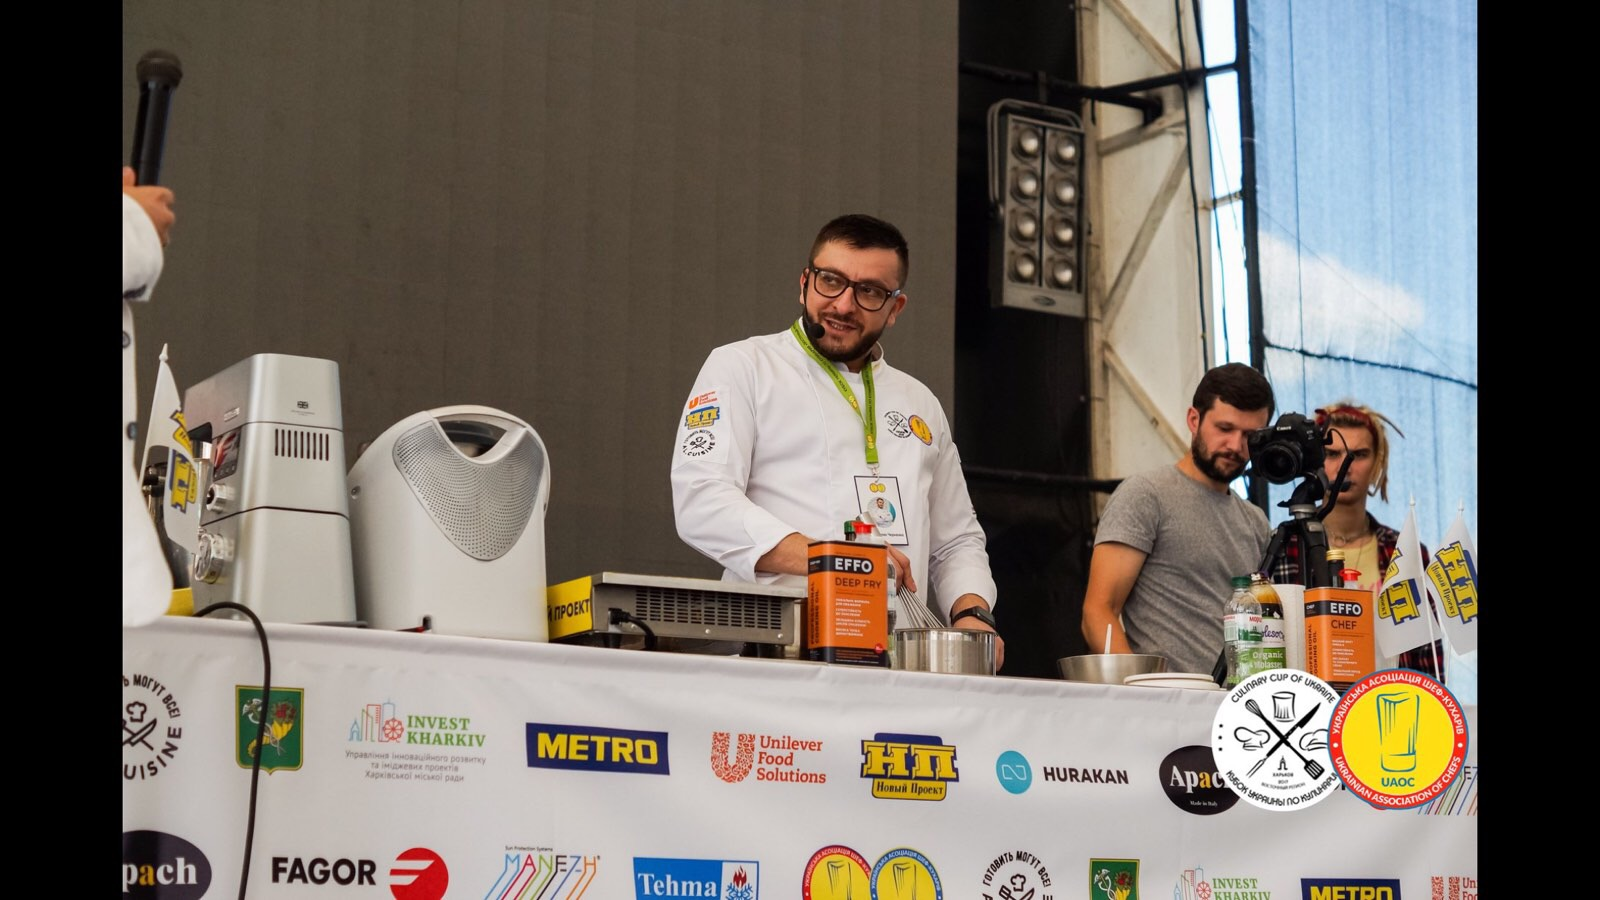 Kostiantyn Chernenko chef 6